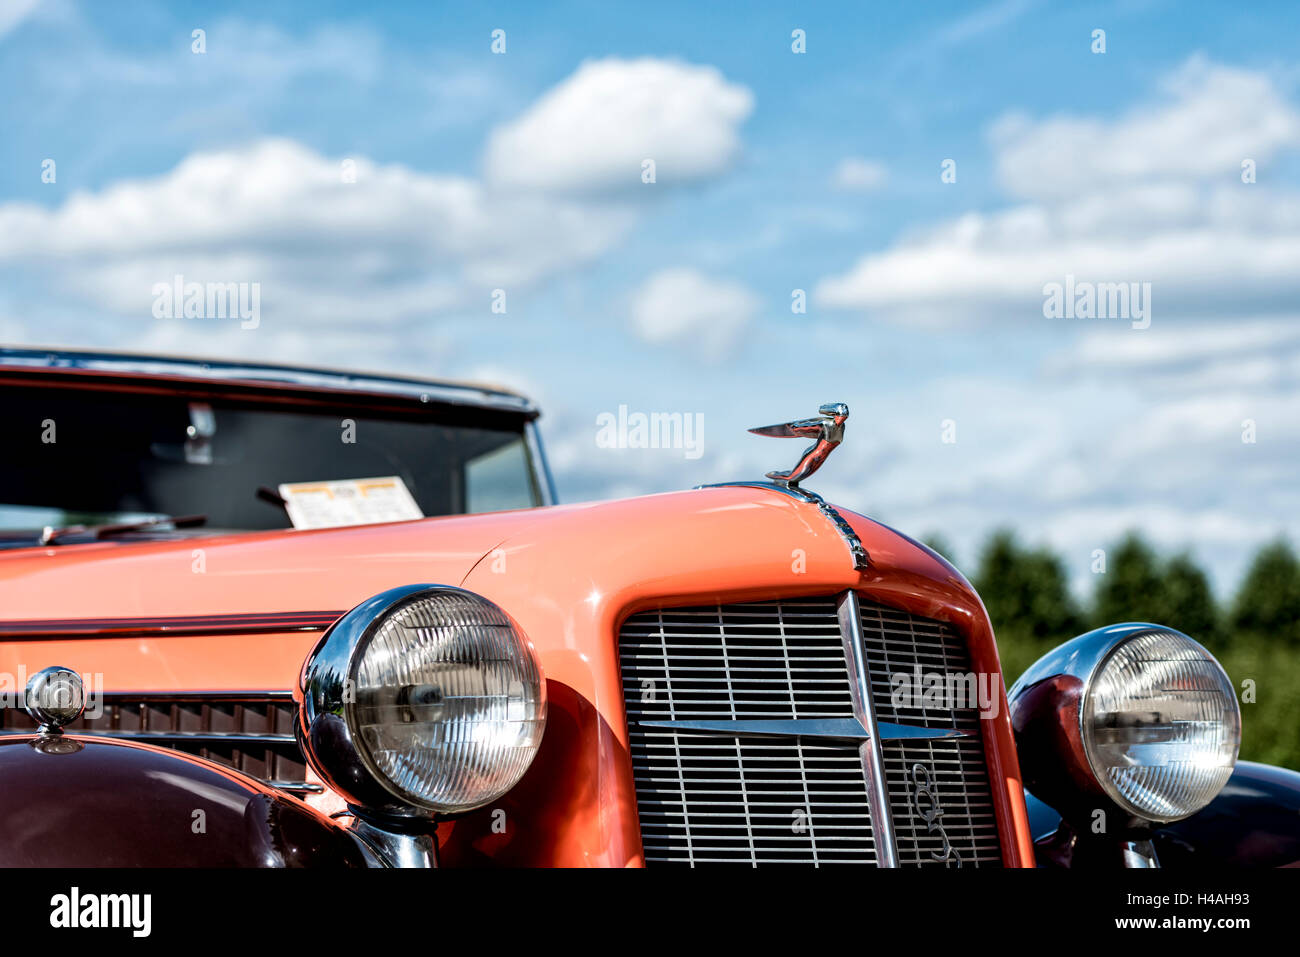 Germany, Schwetzingen, Classic gala, cooler front of an Auburn 852 Speedster, year of manufacture 1936, - Stock Image